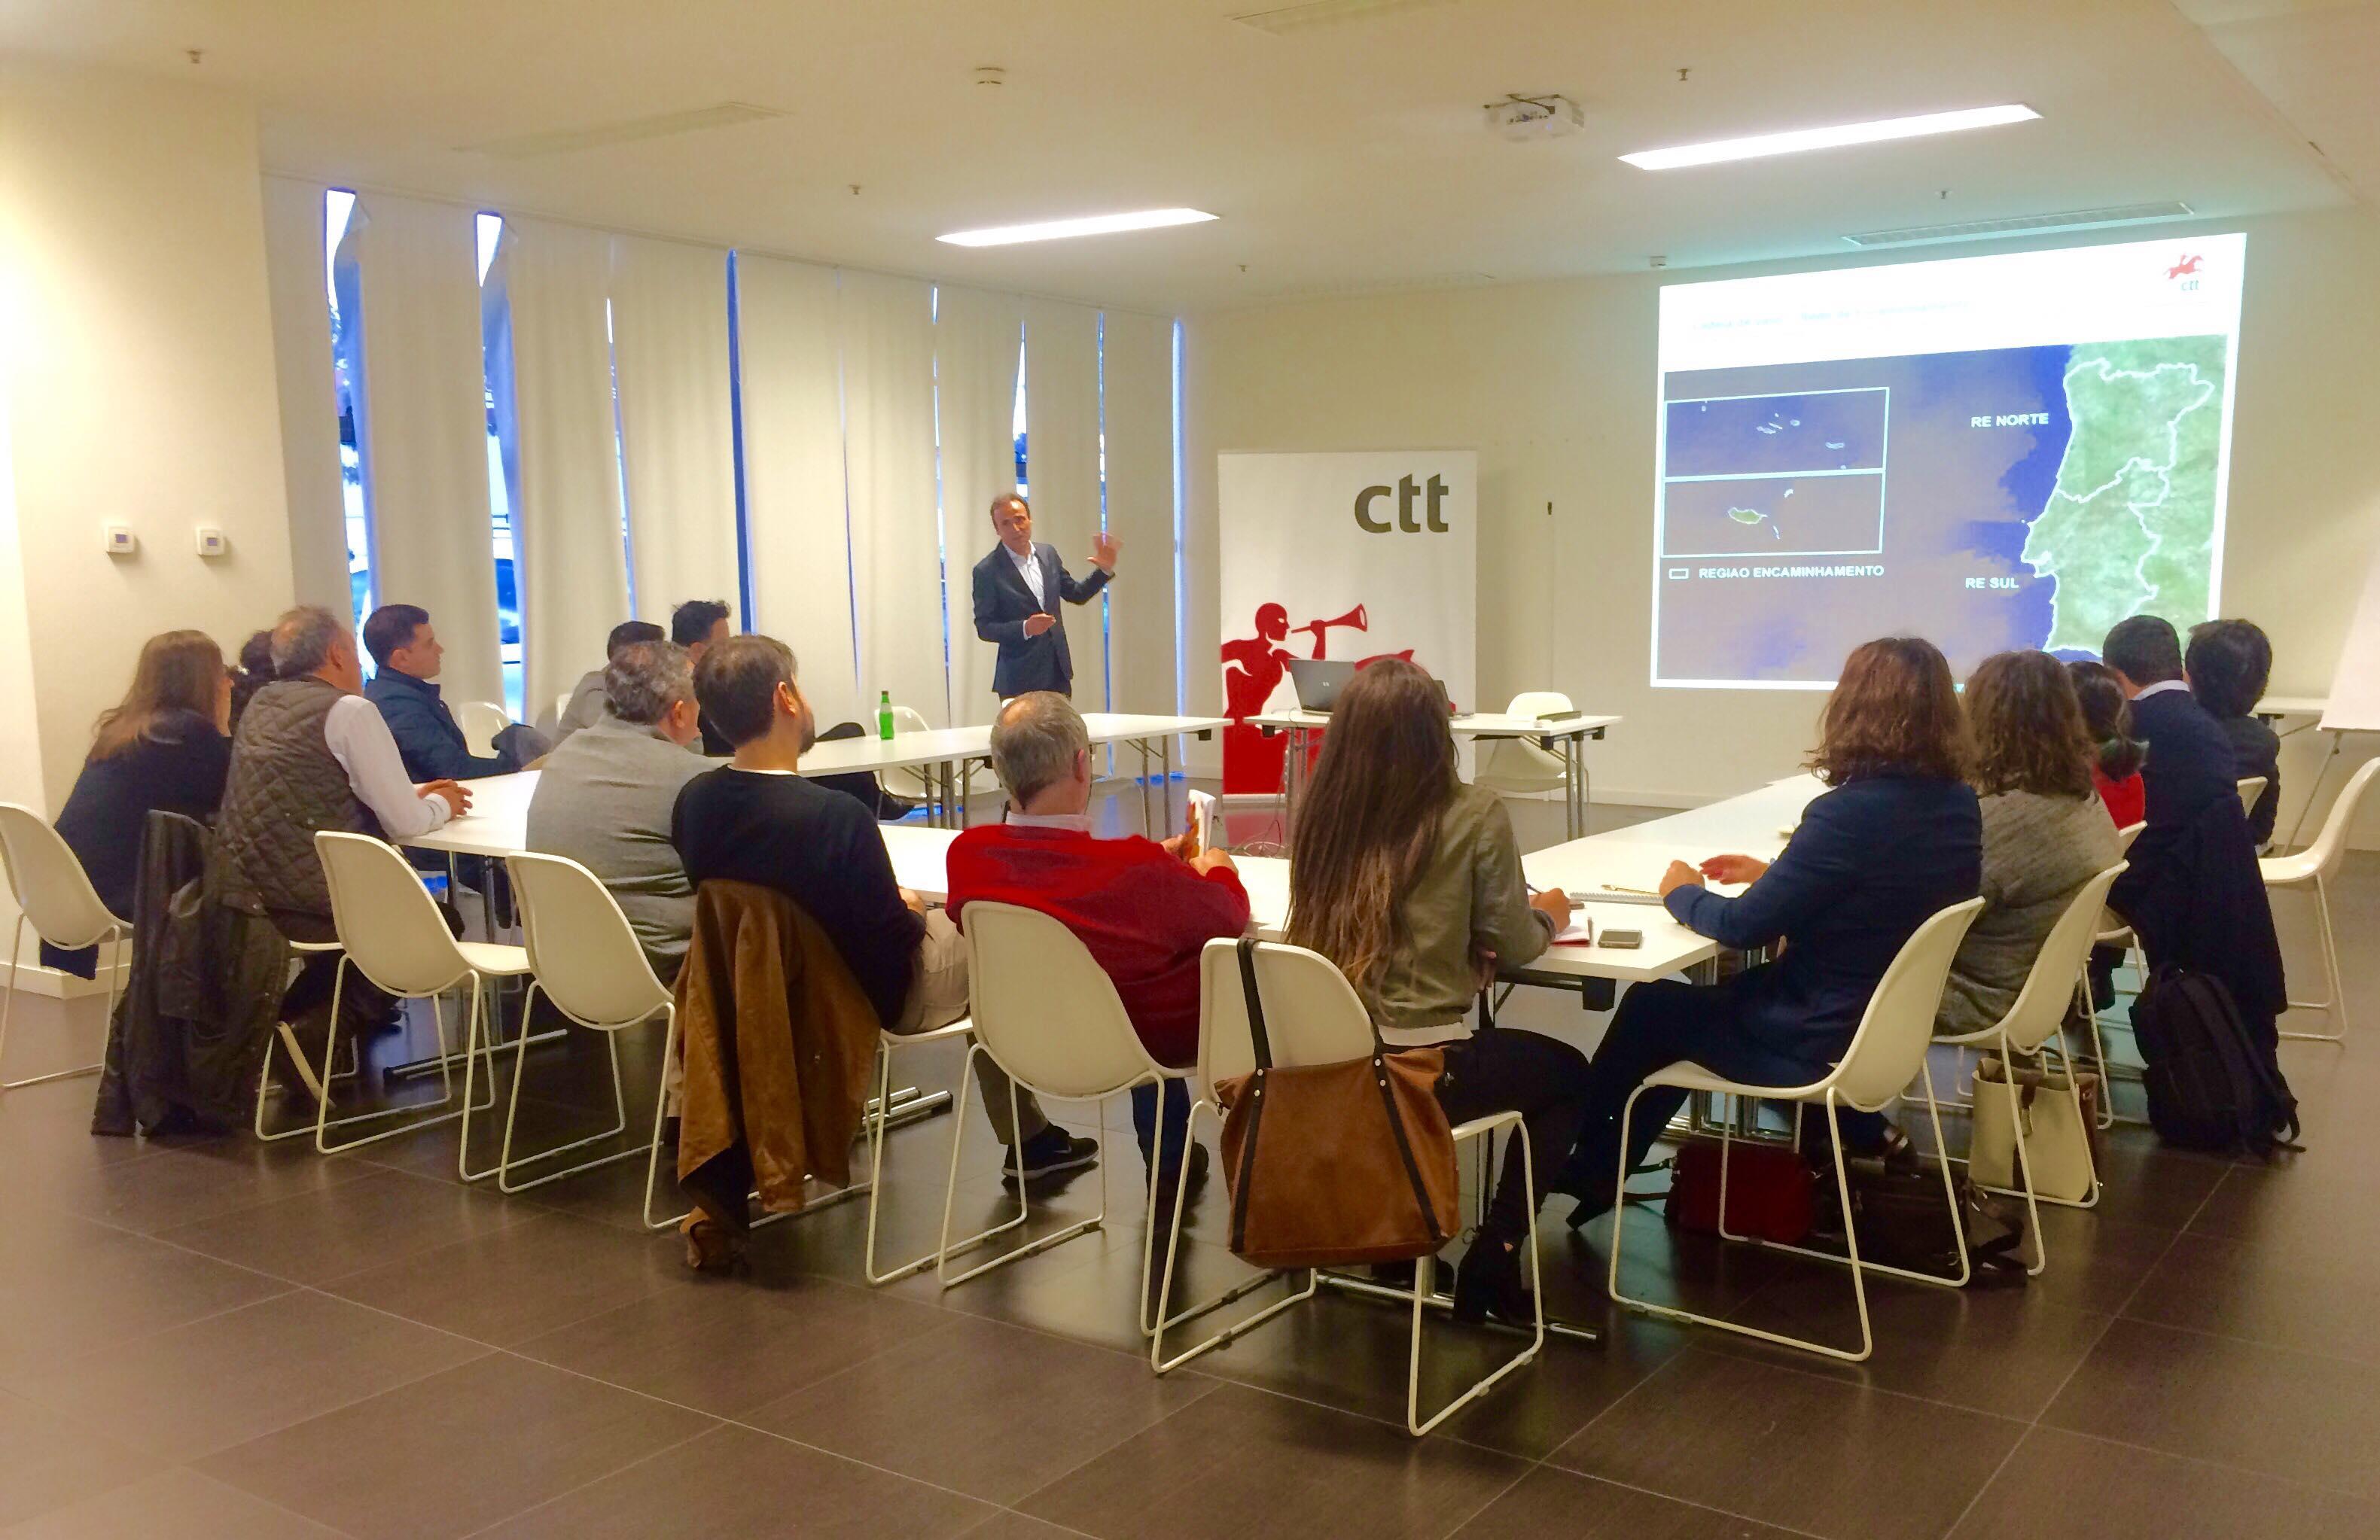 Visita Estudo CTT 13-04-2018_11